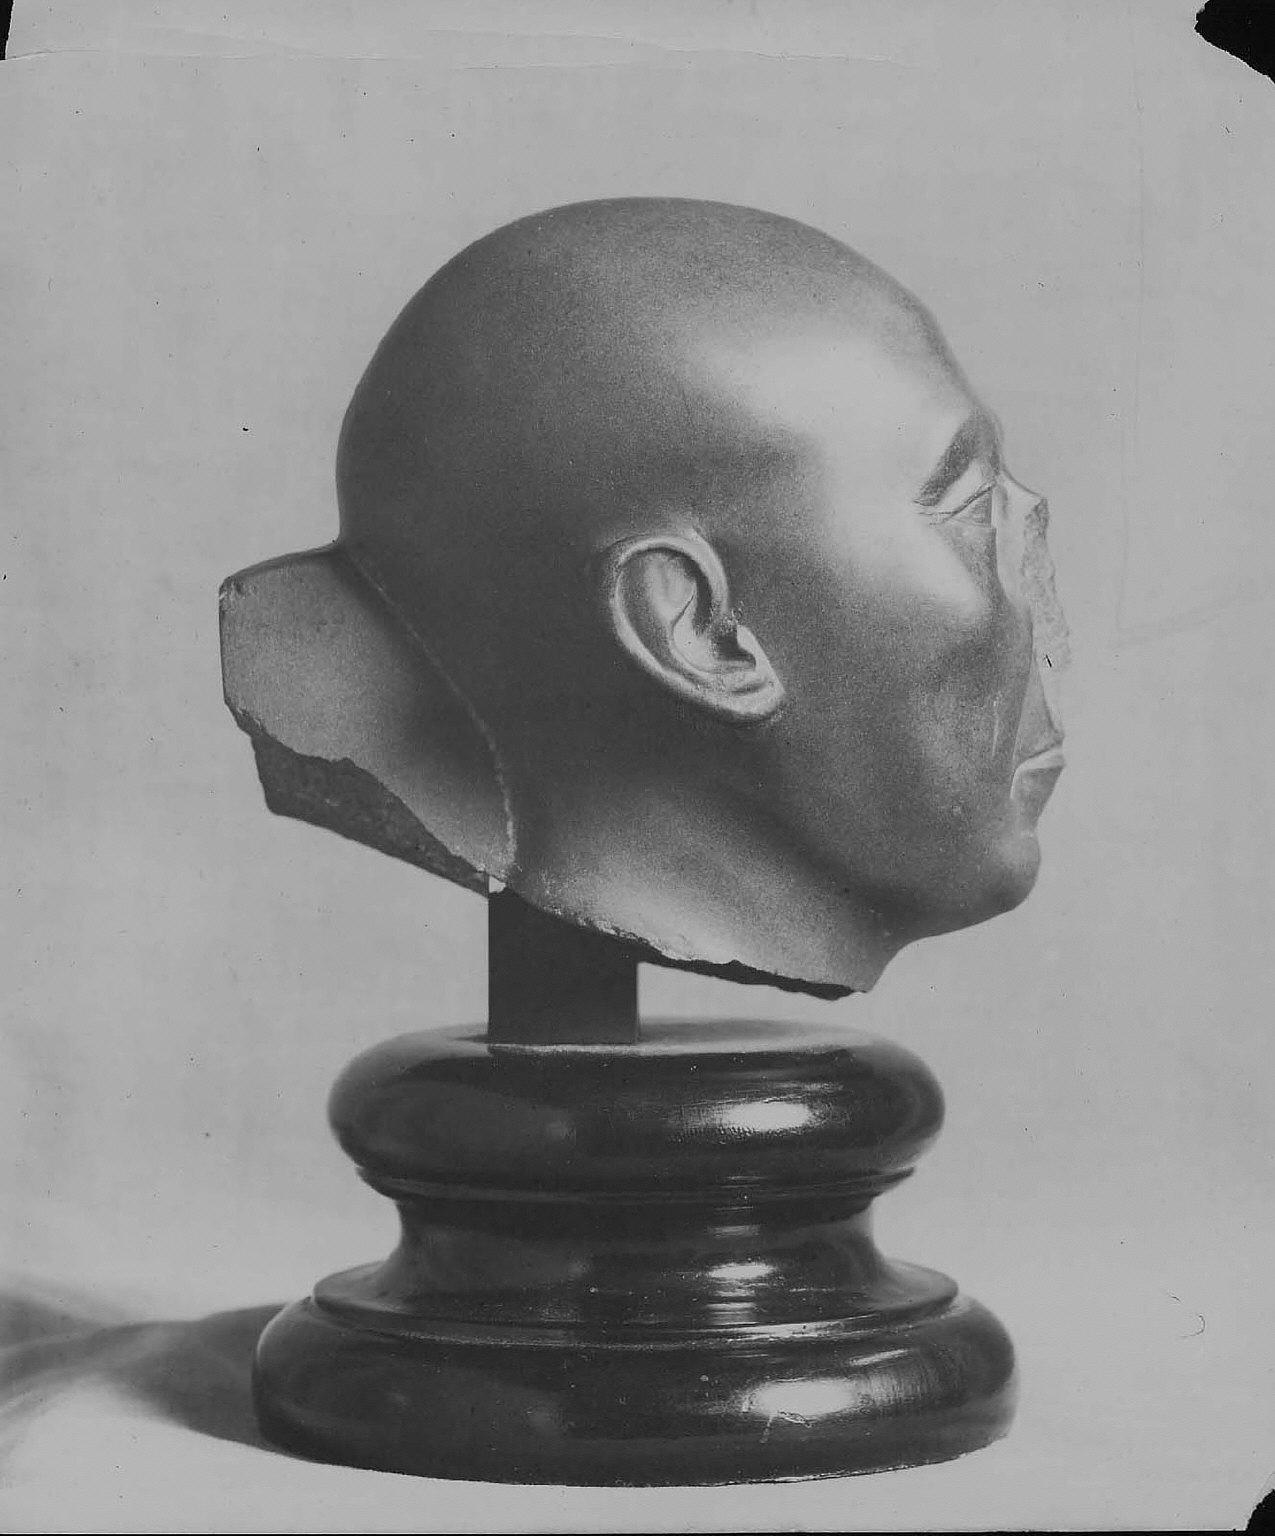 The Boston Green Head